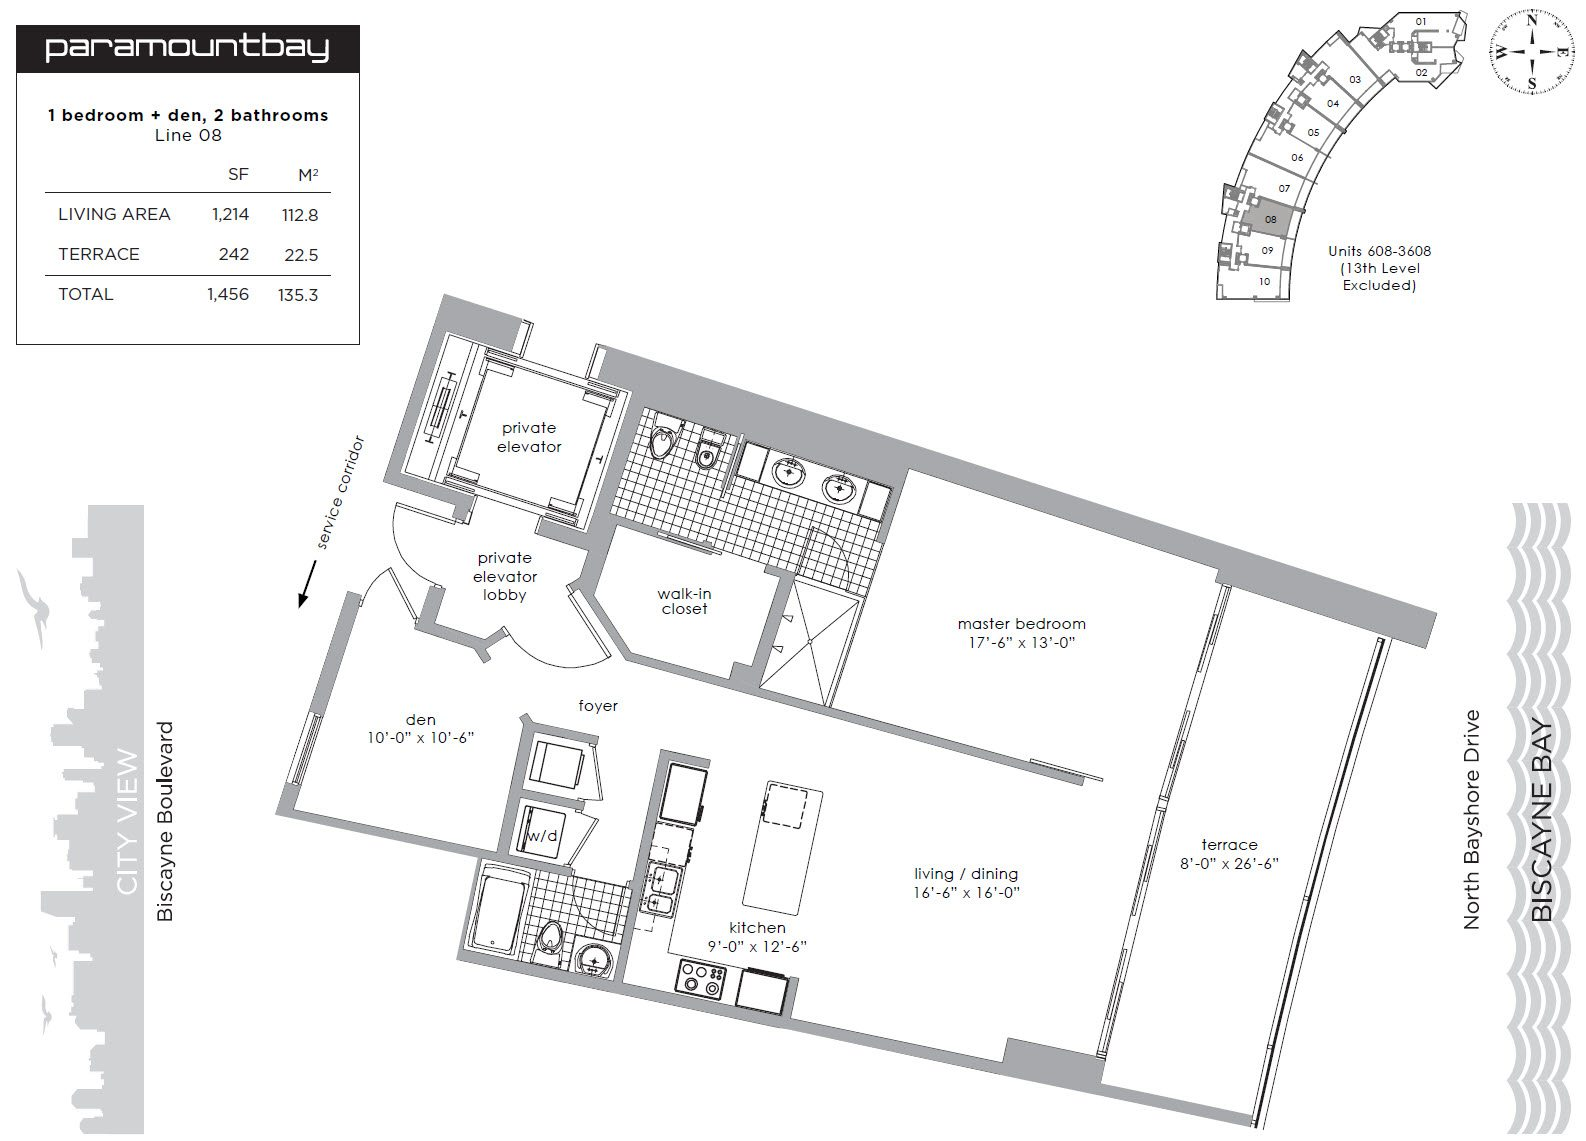 Paramount Bay unit 1908 floor plan